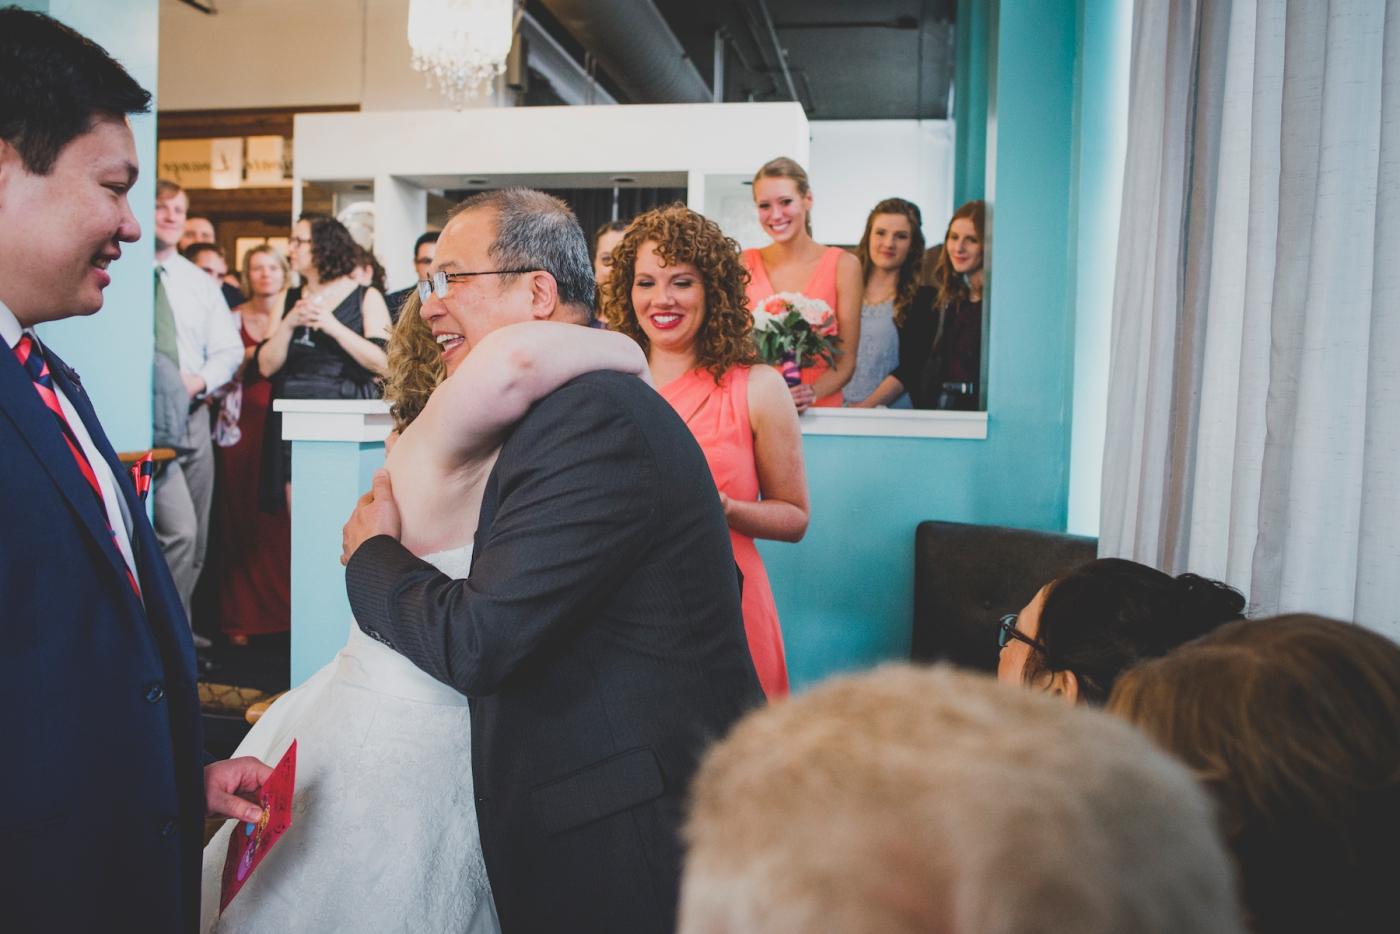 DSC_2985Everett_Wedding_Ballroom_Jane_Speleers_photography_Rachel_and_Edmund_teaceremony_2017